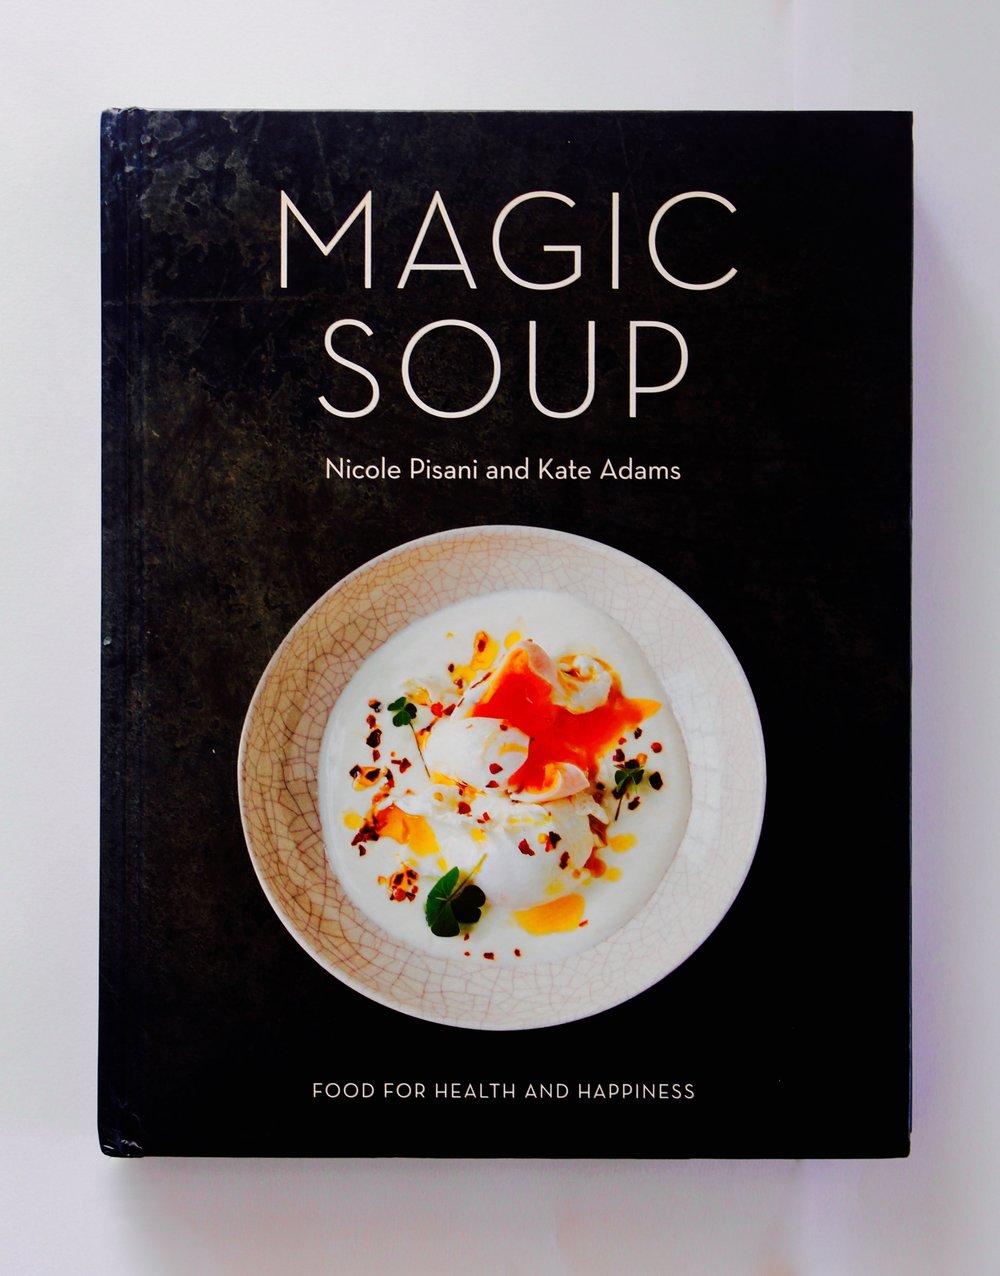 Magic Soup , Nicole Pisani and Kate Adams, W&N, design by Caroline Clark